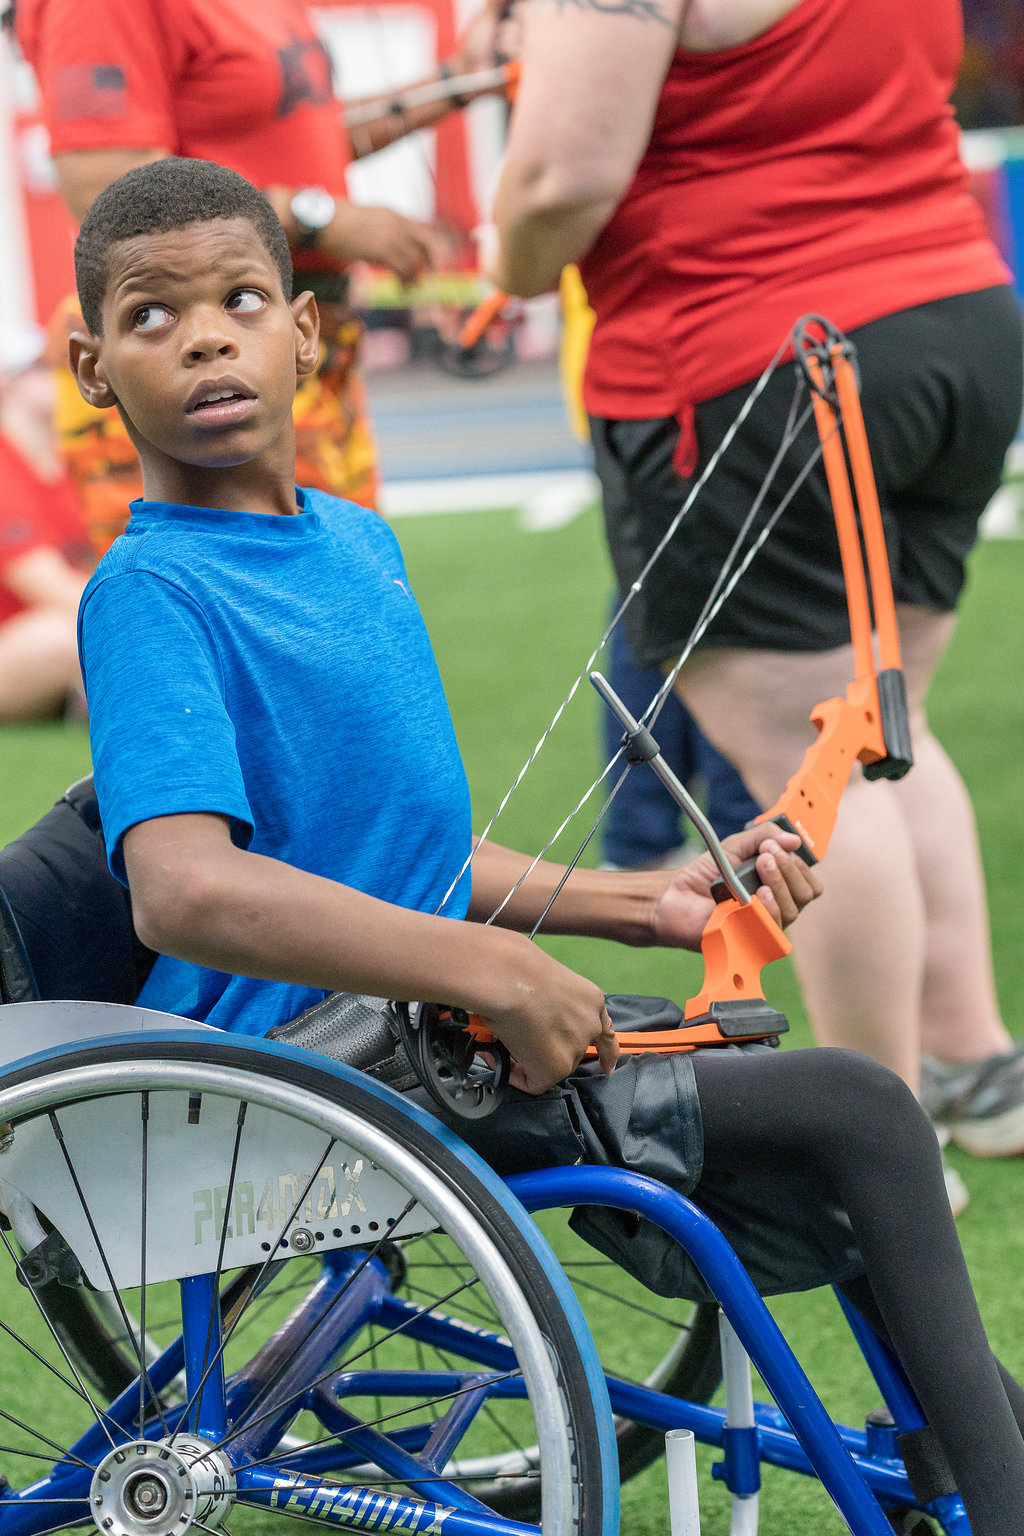 wheelchair archery black boy wheelchair arrow bow